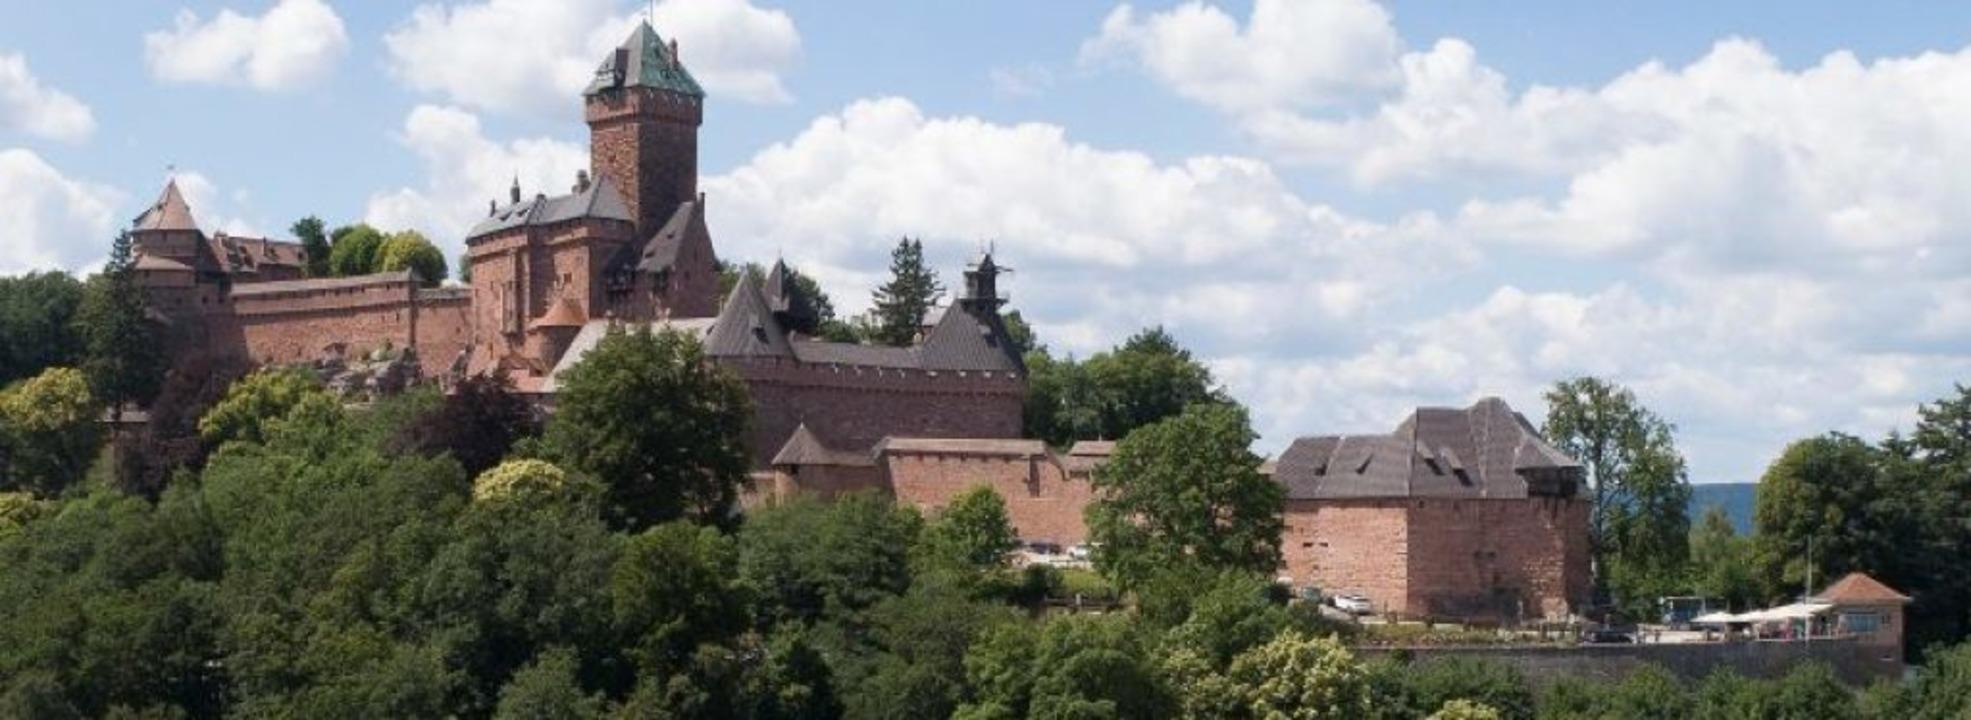 dfgdgfdgafdasdfsa: die Hohkönigsburg  | Foto: SEBASTIEN BOZON